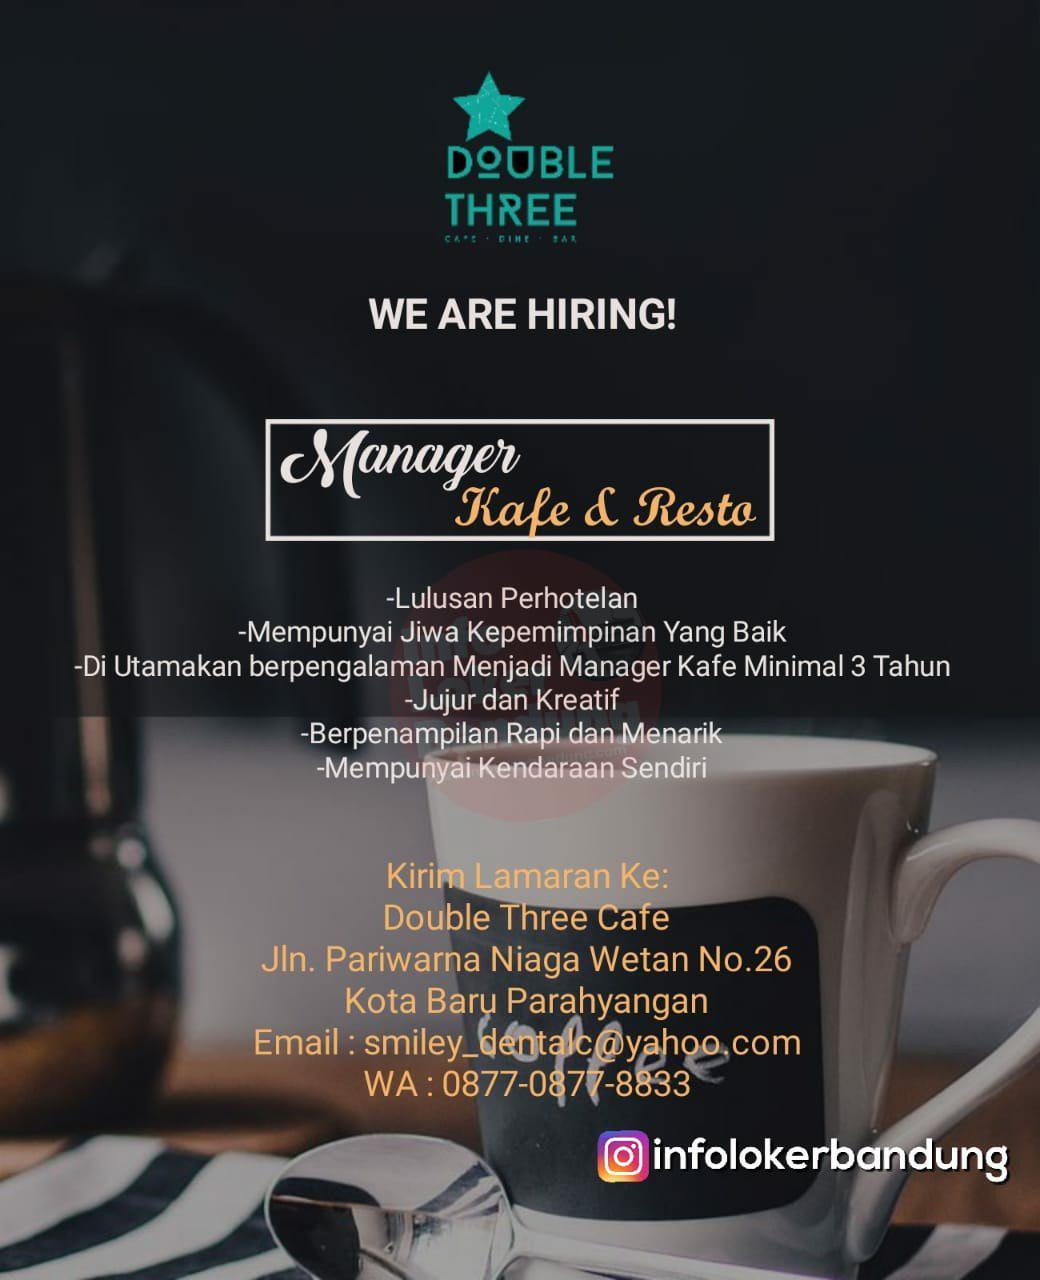 Lowongan Kerja Manager Kafe & Resto Double Three Bandung Januari 2019